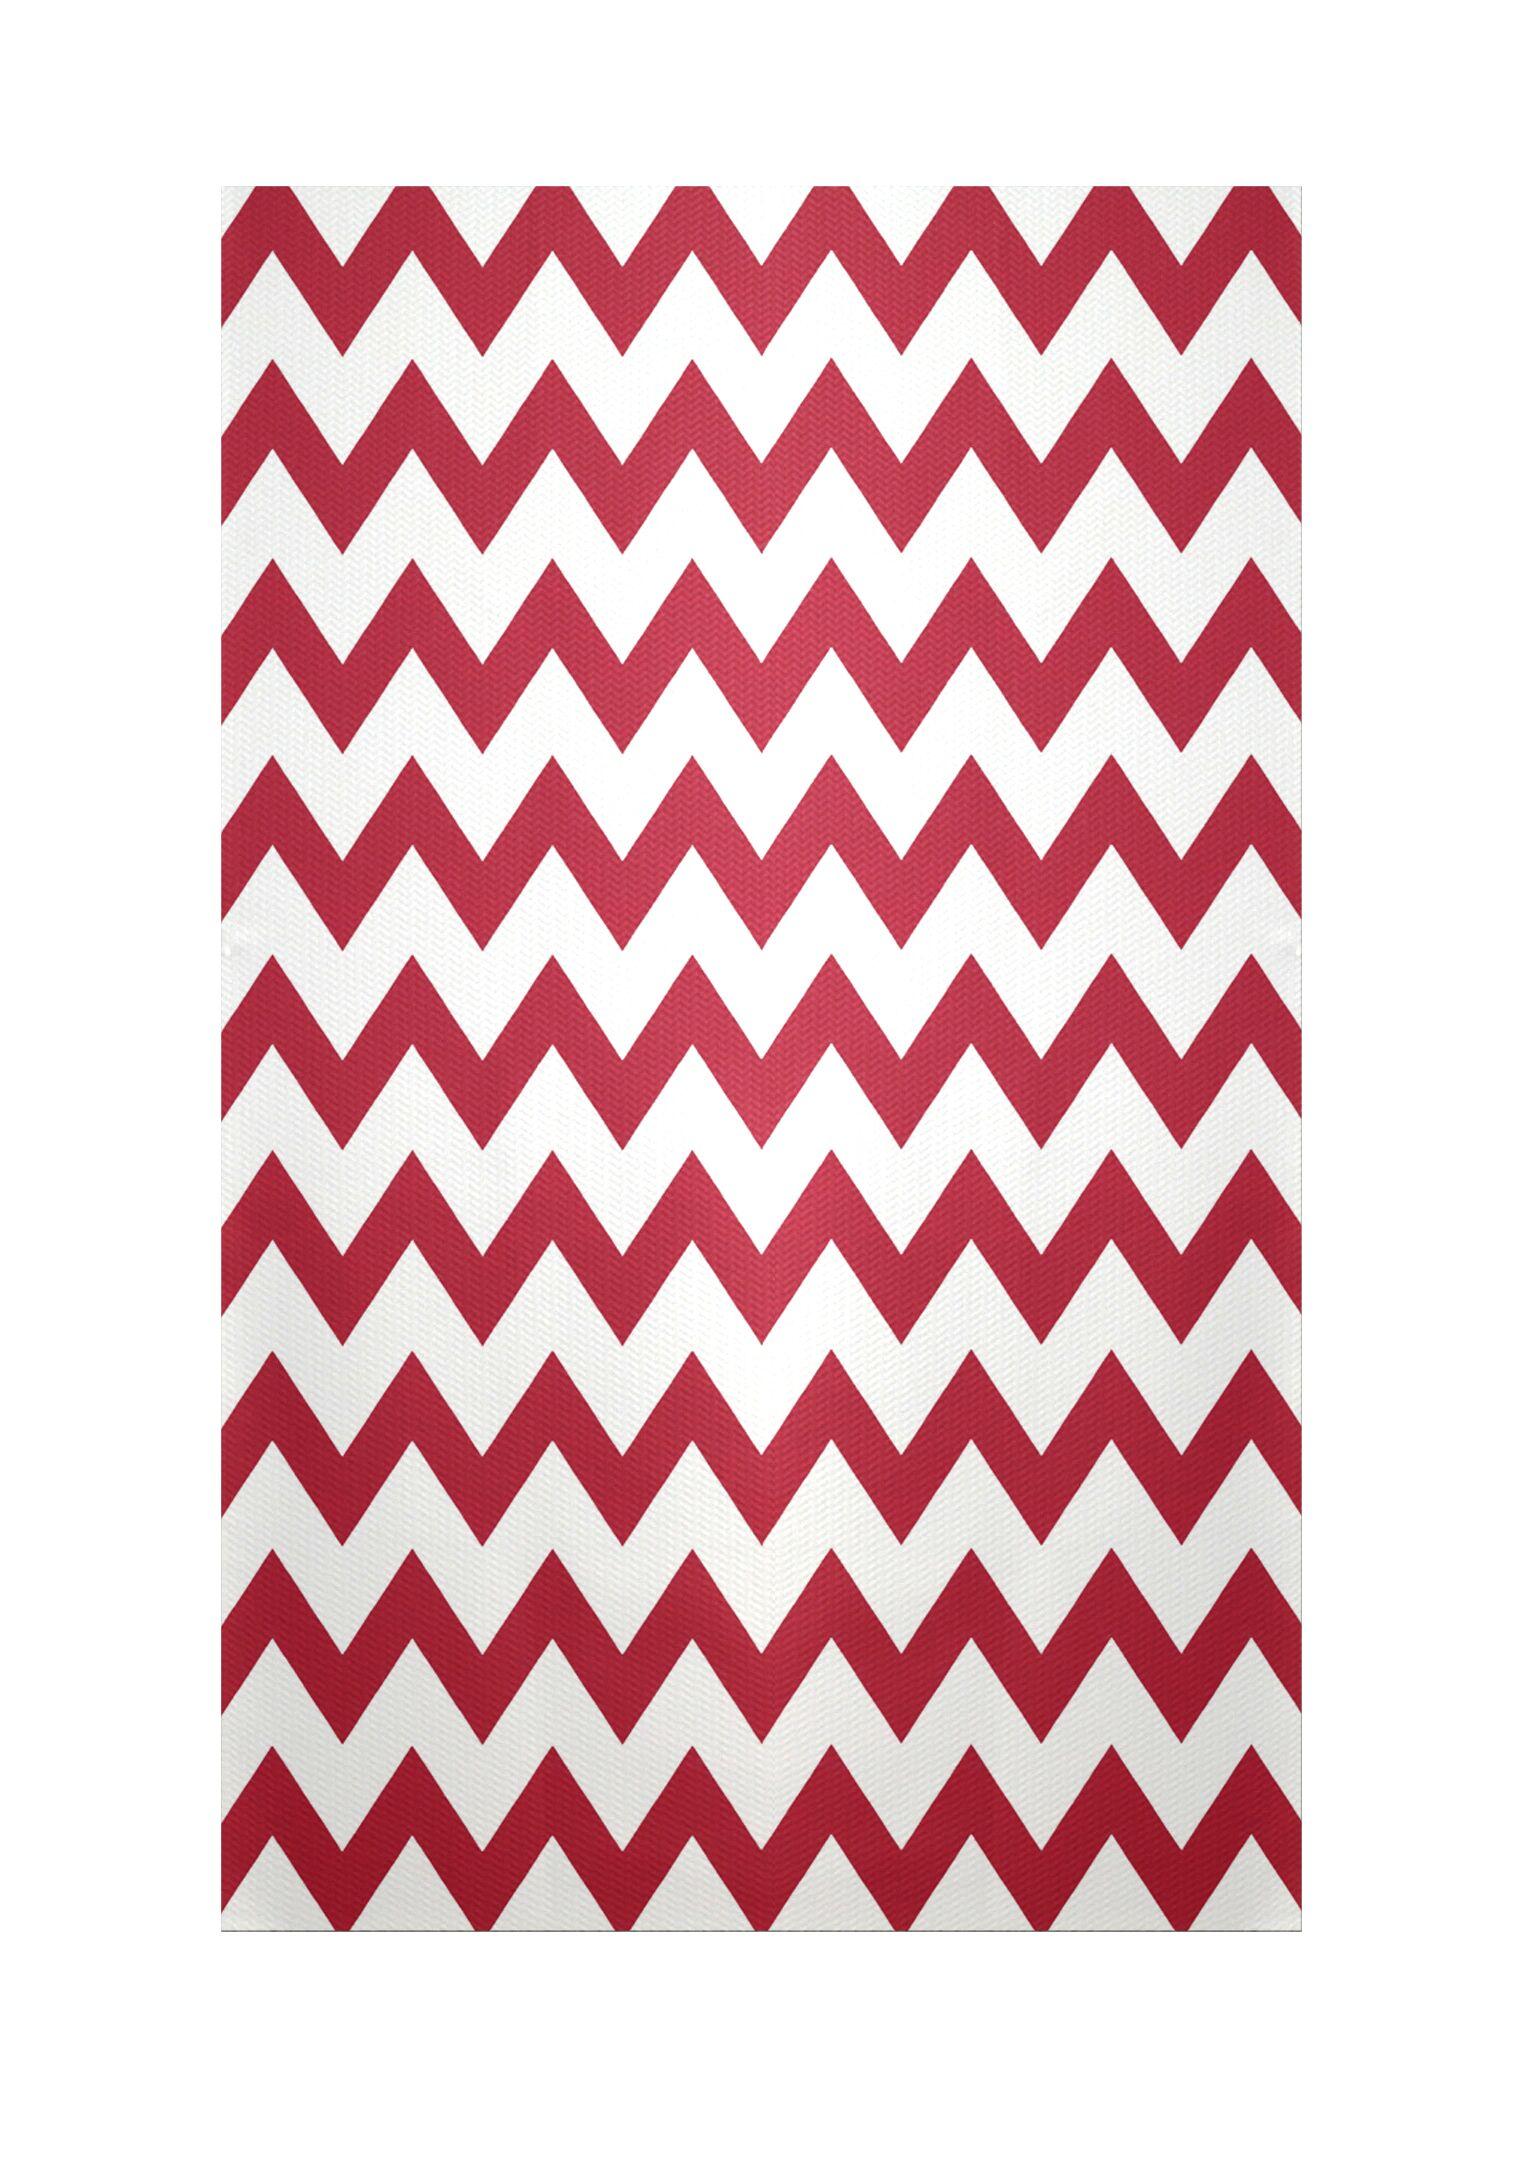 Chevron Red Indoor/Outdoor Area Rug Rug Size: Rectangle 3' x 5'